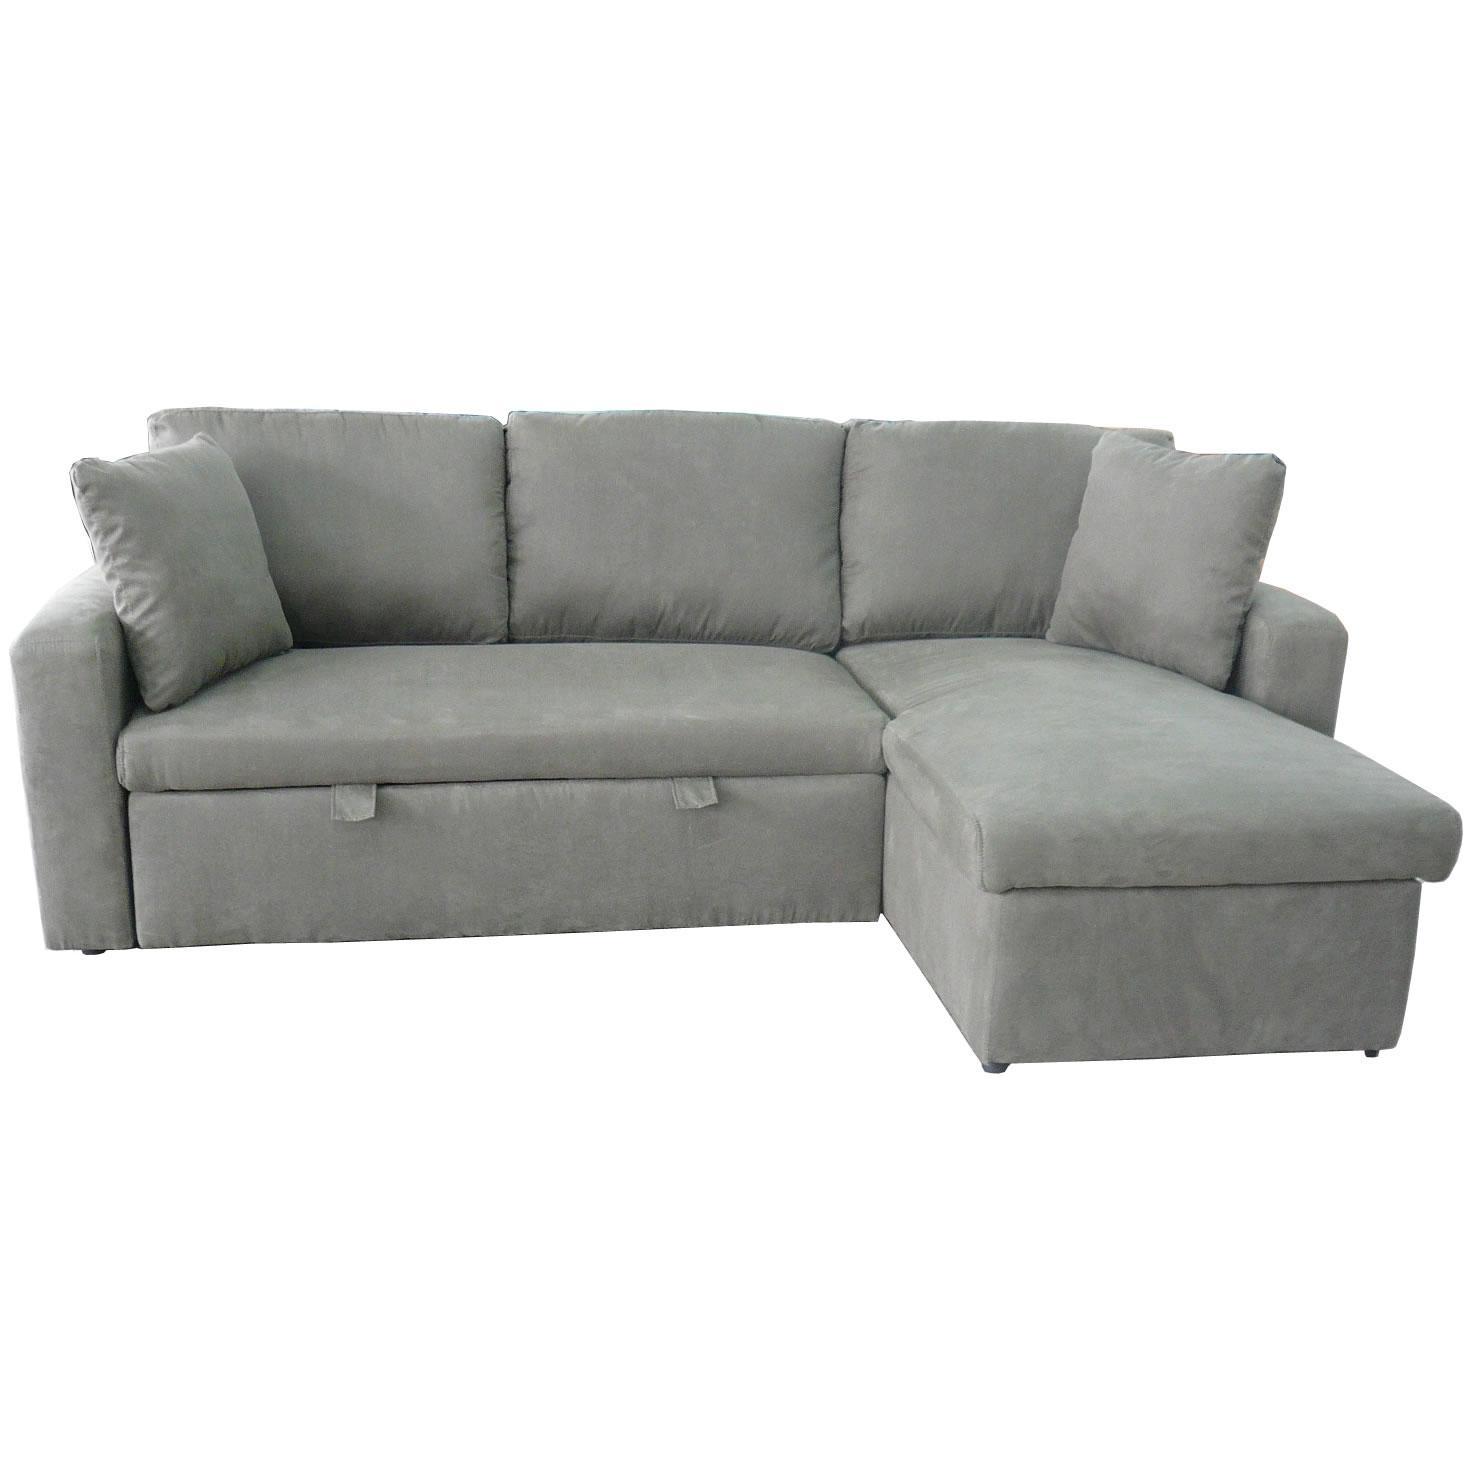 Corner Unit Sofa Beds With Storage   Centerfieldbar With Regard To Sofa Corner Units (Image 5 of 24)